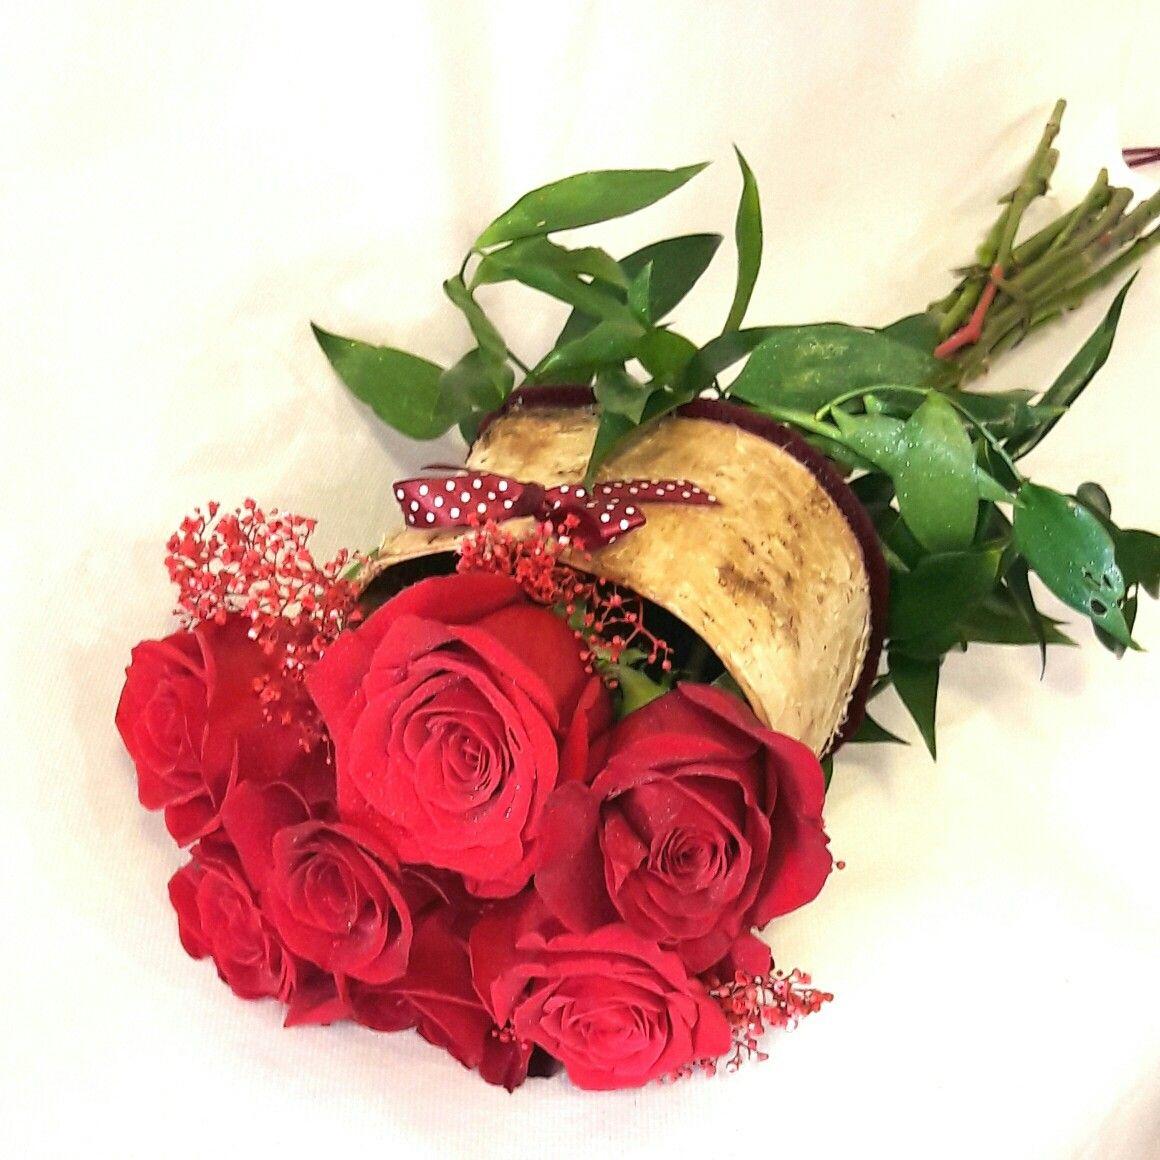 Roses  #redroses,#roses,#bouqet,#redrosesbouqet